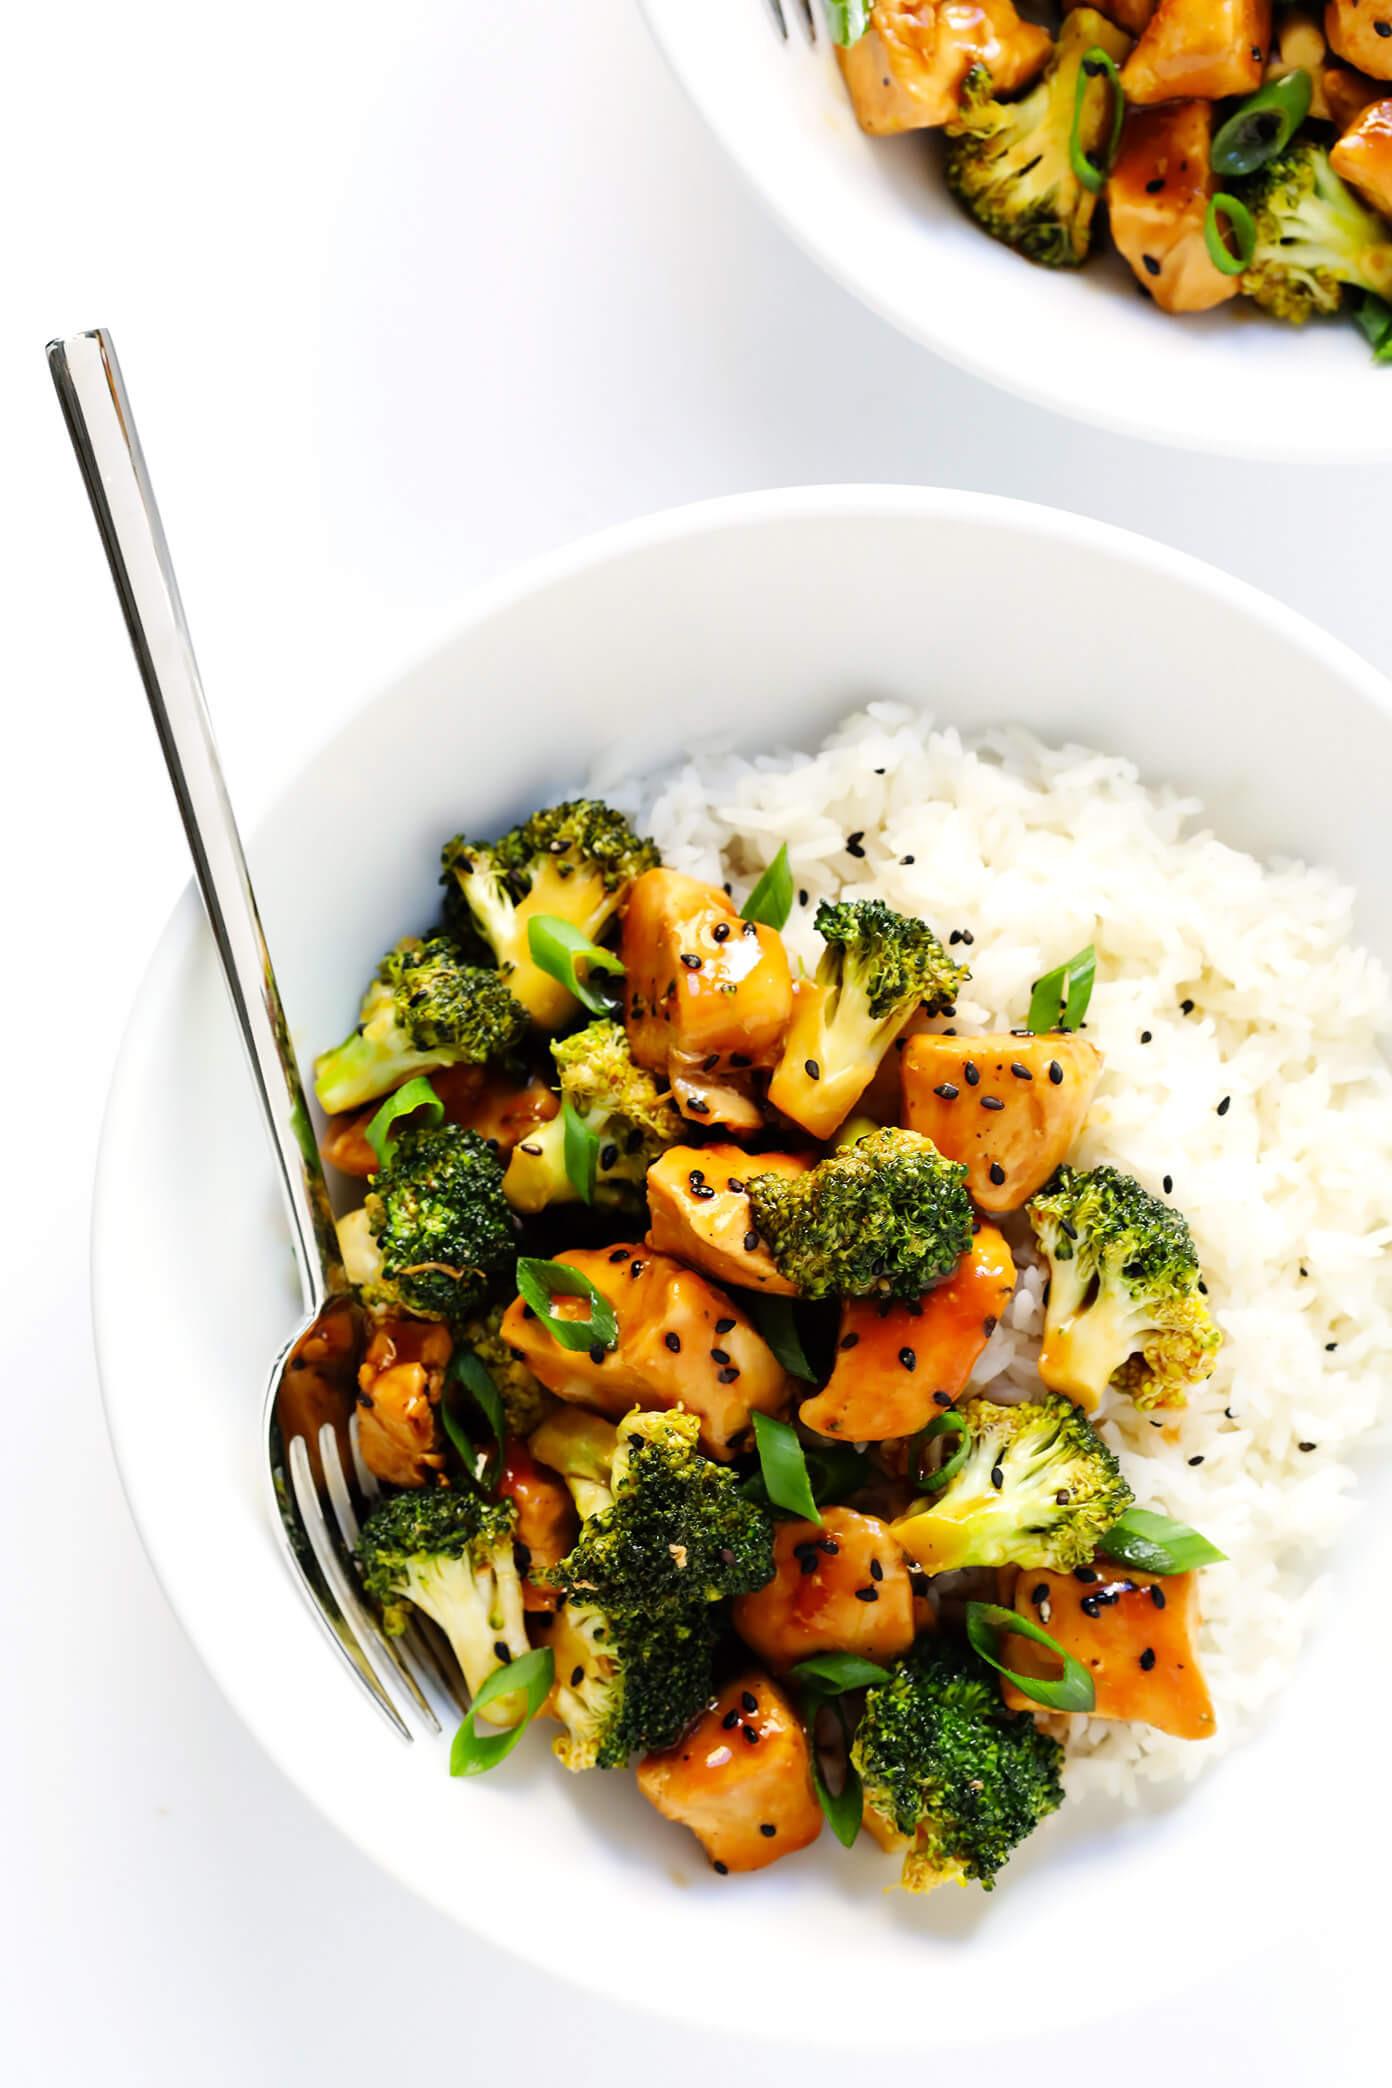 Chicken And Broccoli Recipes  12 Minute Chicken and Broccoli